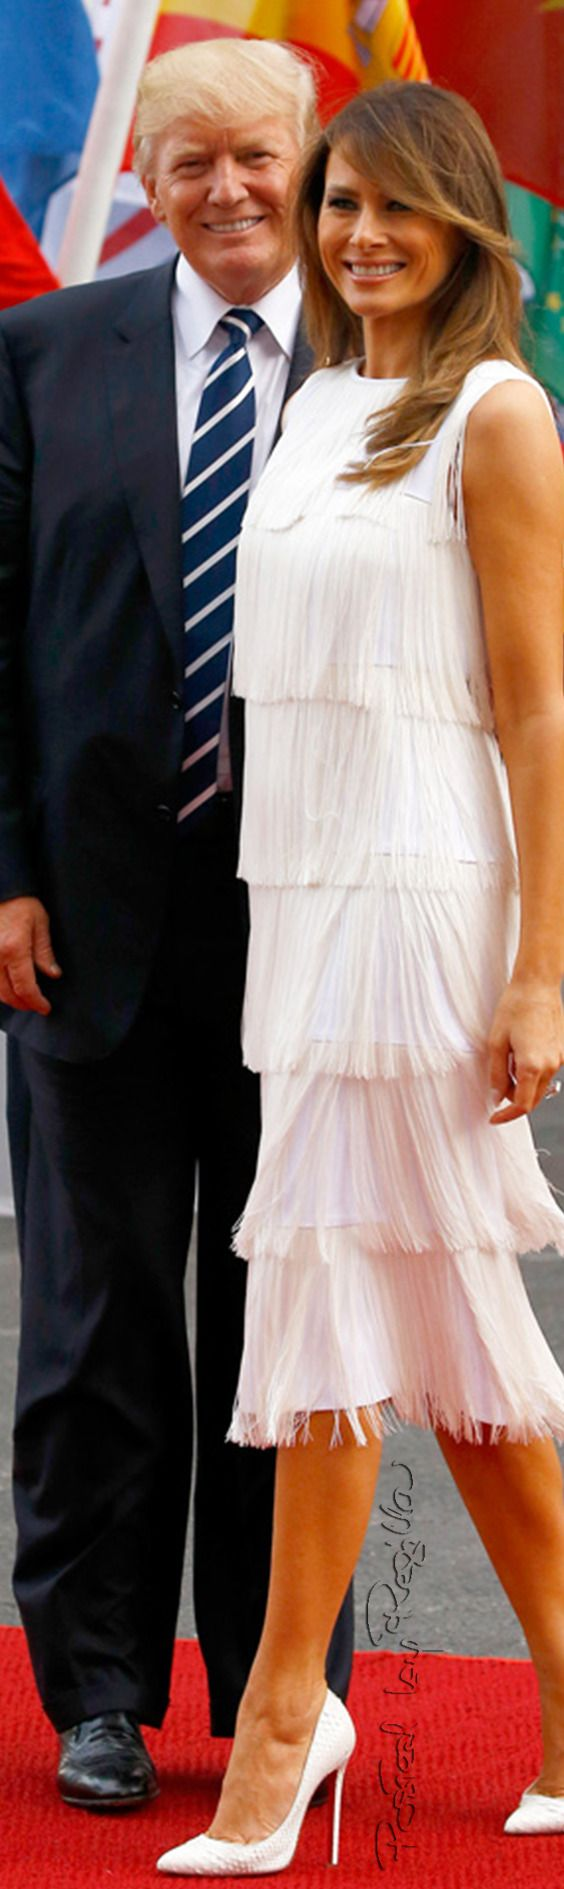 Regilla ⚜ Donald Trump and Melania at the G20 summit in Hamburg, 2017